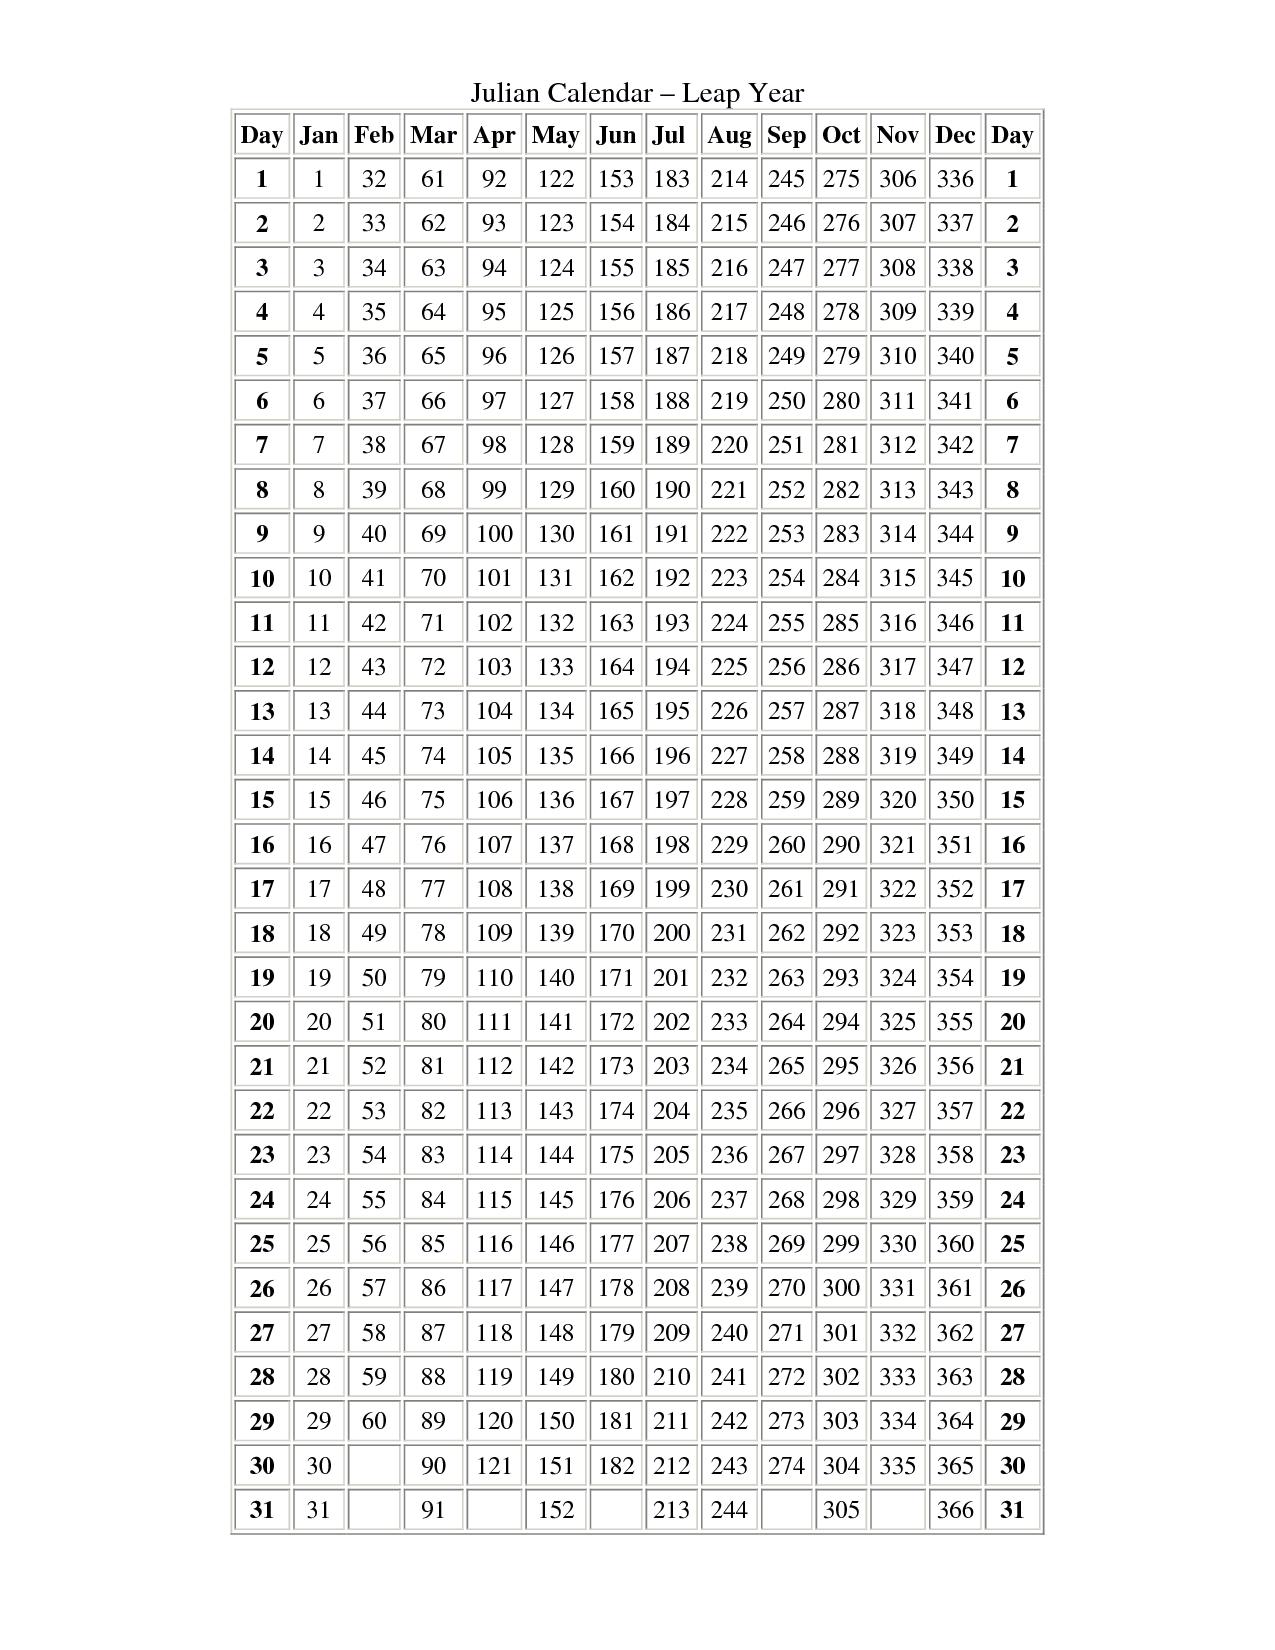 Julian Date Chart 2016 - Caska In Leap Year Julian Calendar - Printable Calendar 2020-2021